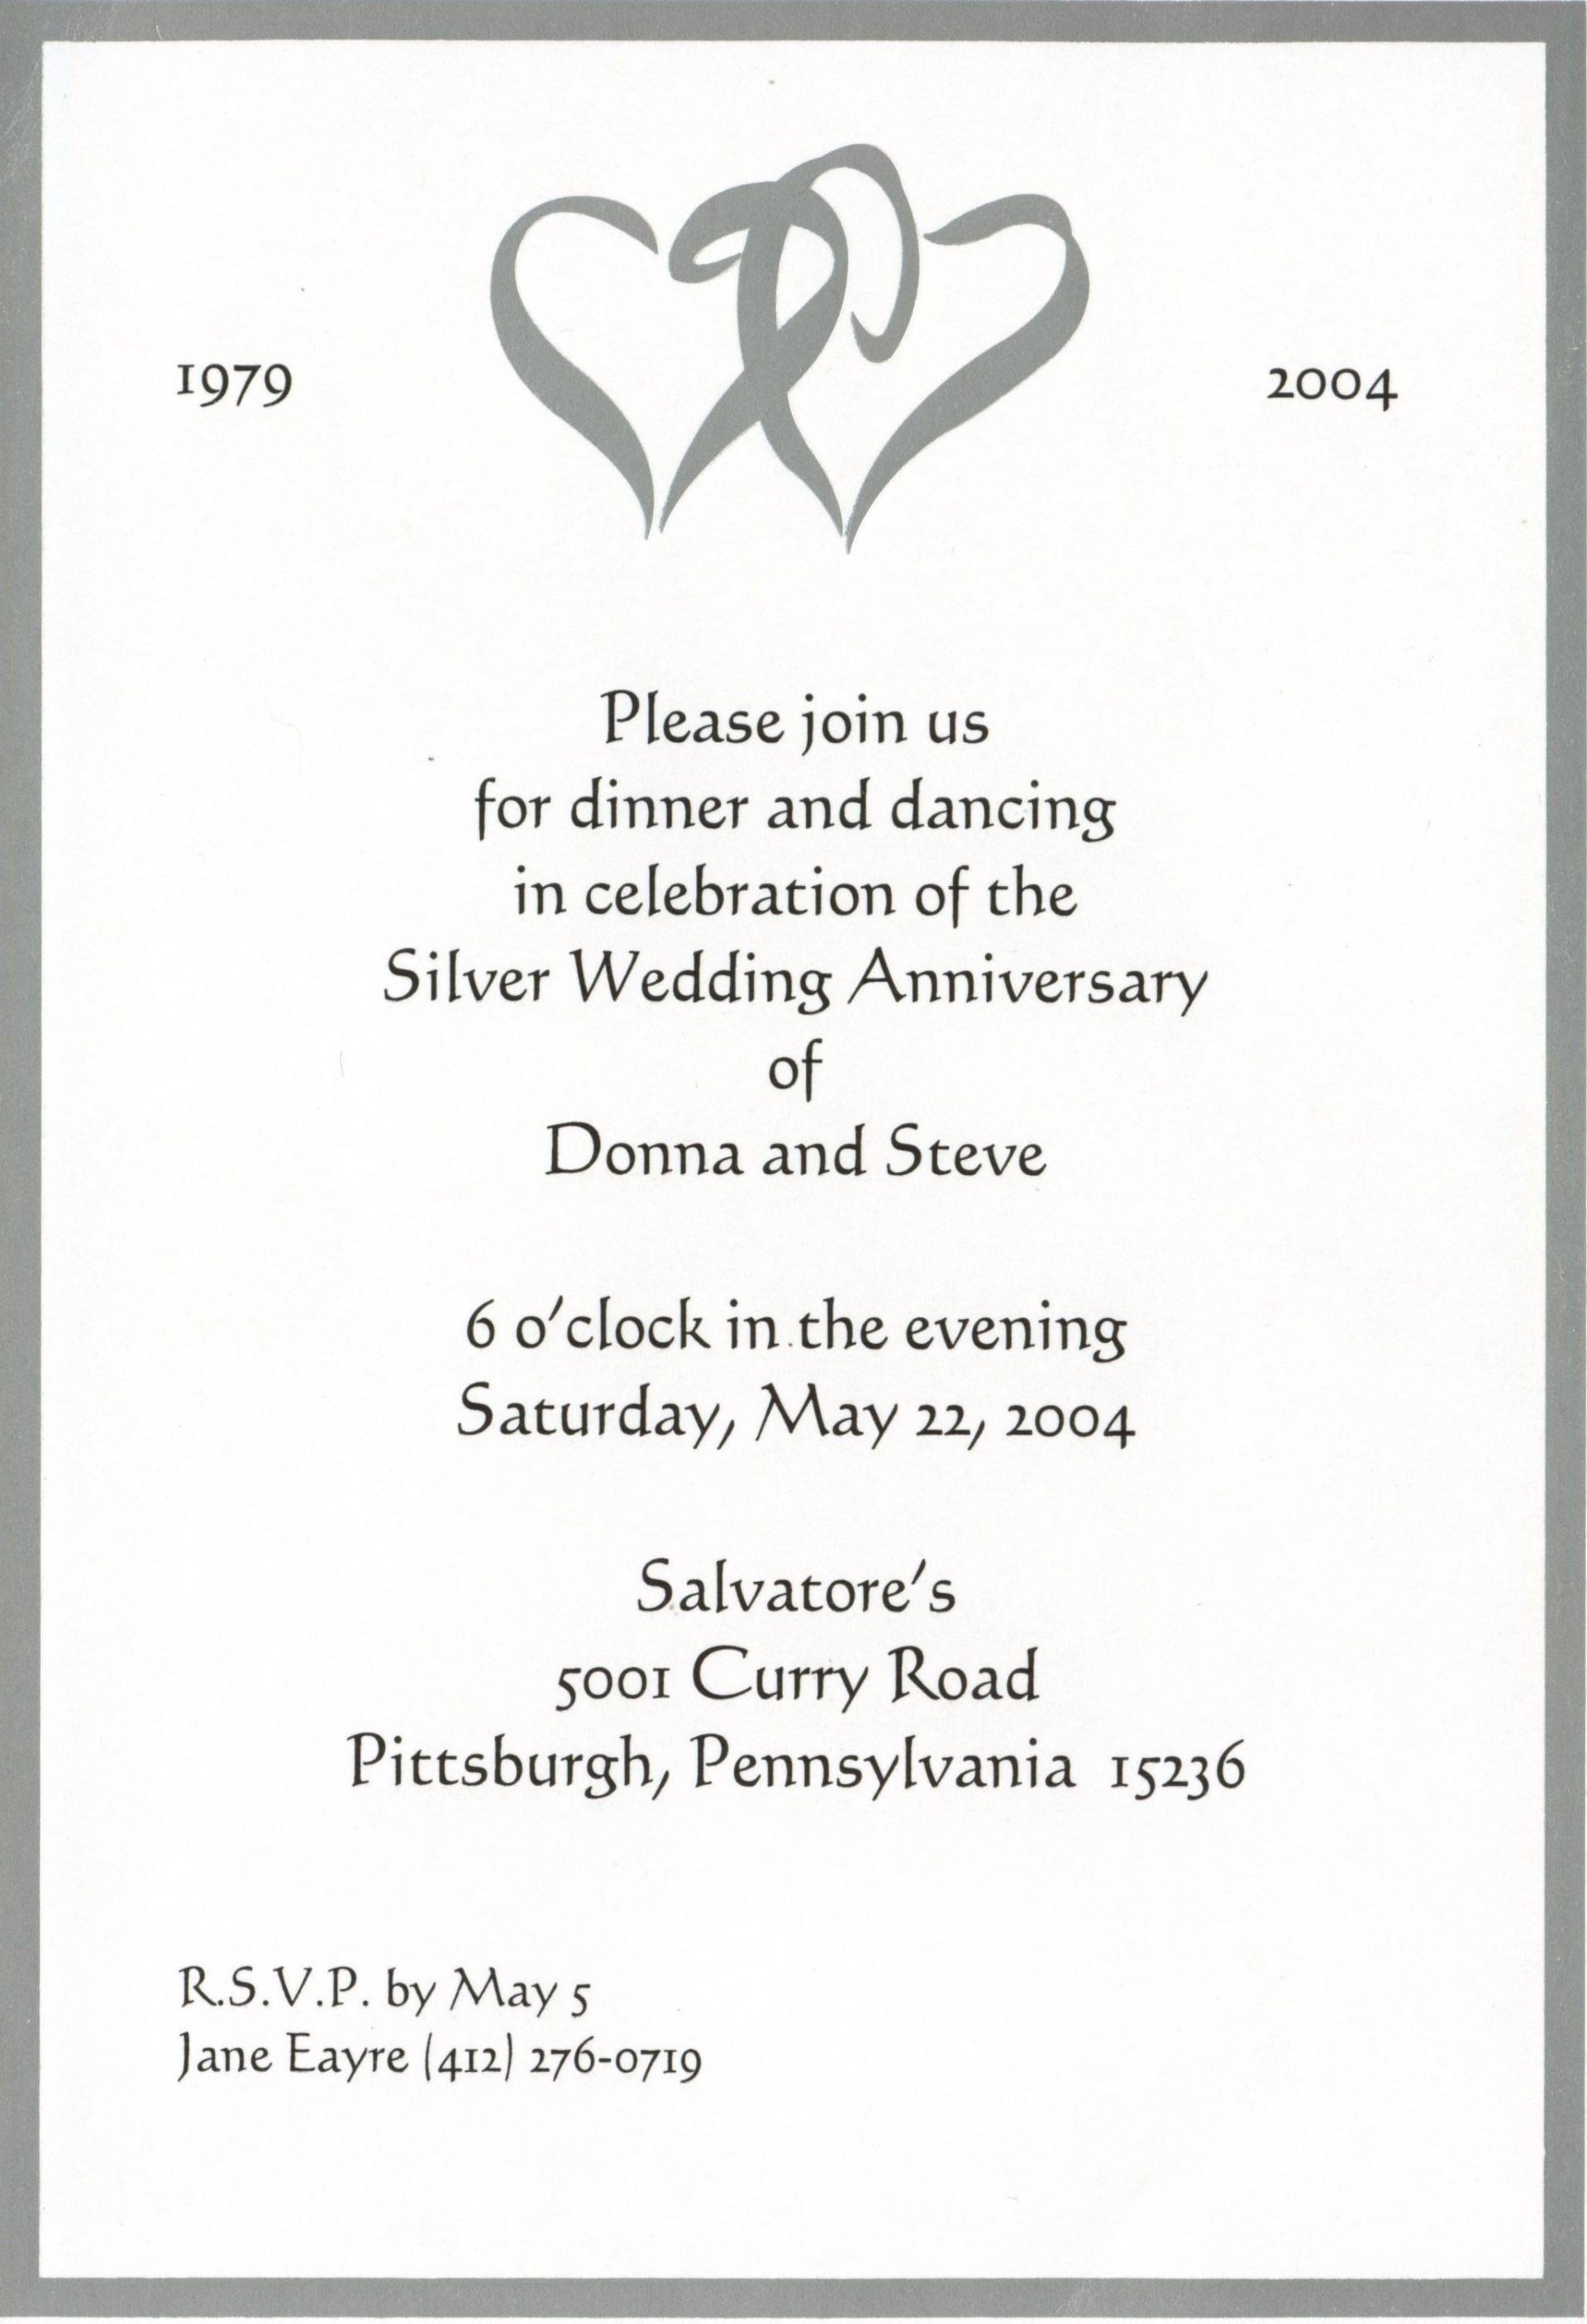 007 Unusual 50th Anniversary Invitation Template Image  Wedding Microsoft Word Free Download1920